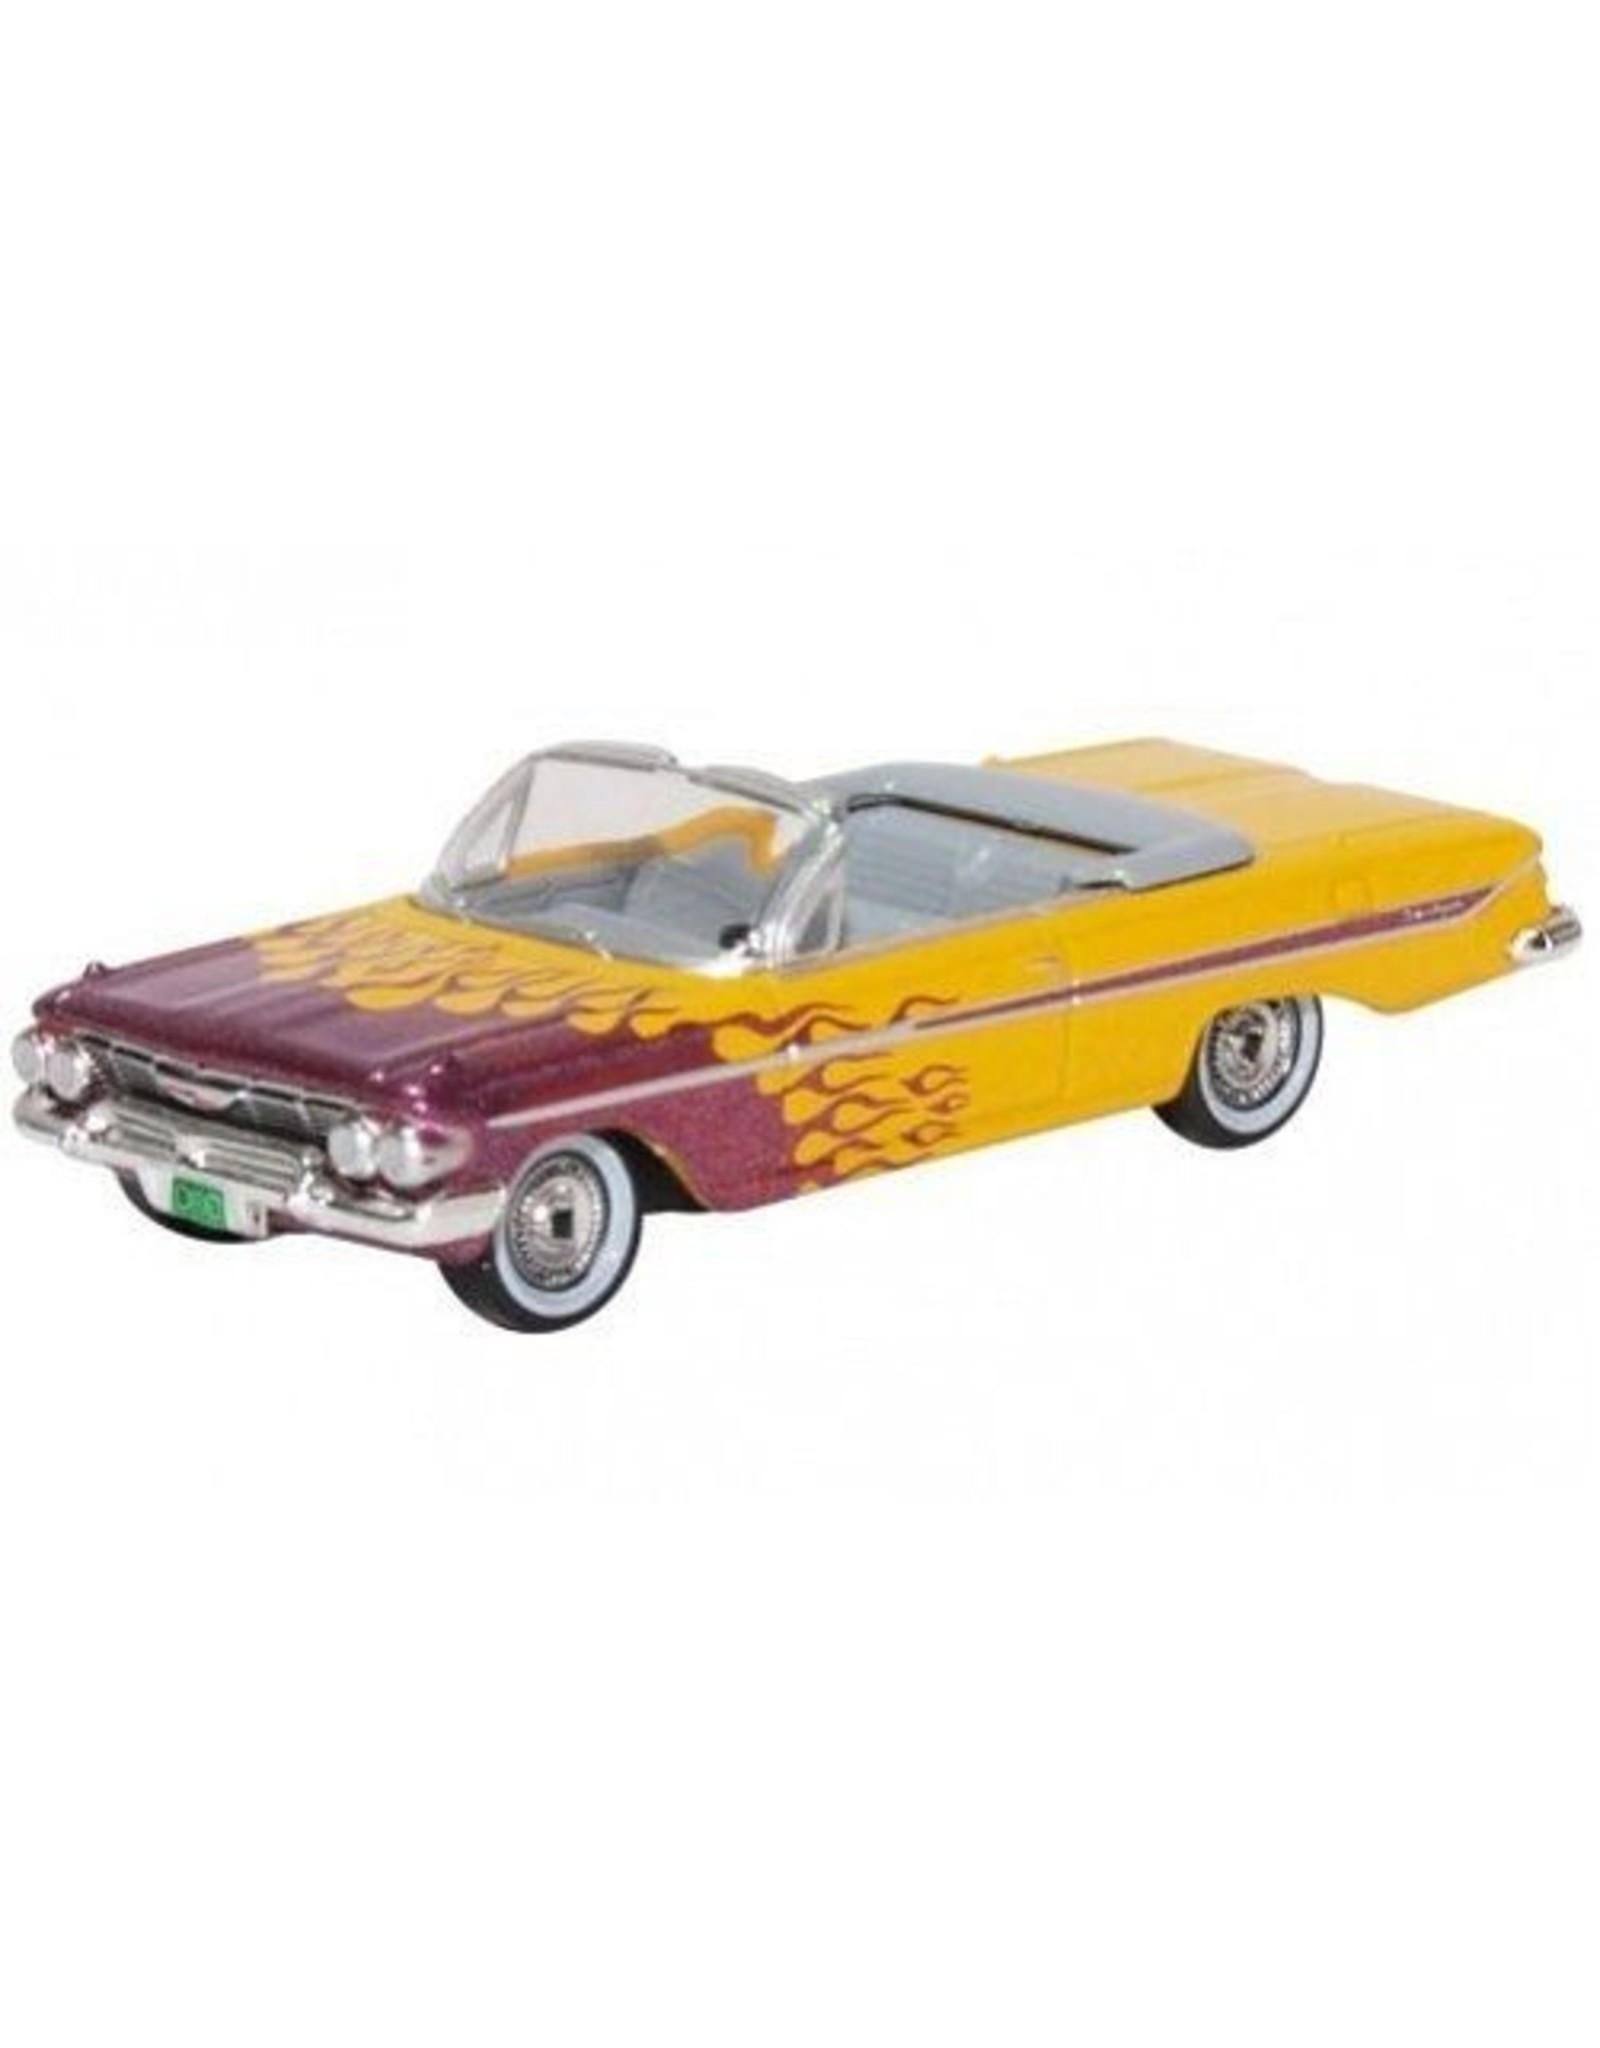 Chevrolet CHEVROLET IMPALA CONVERTIBLE(yellow/violet metallic)HOT ROD-1961